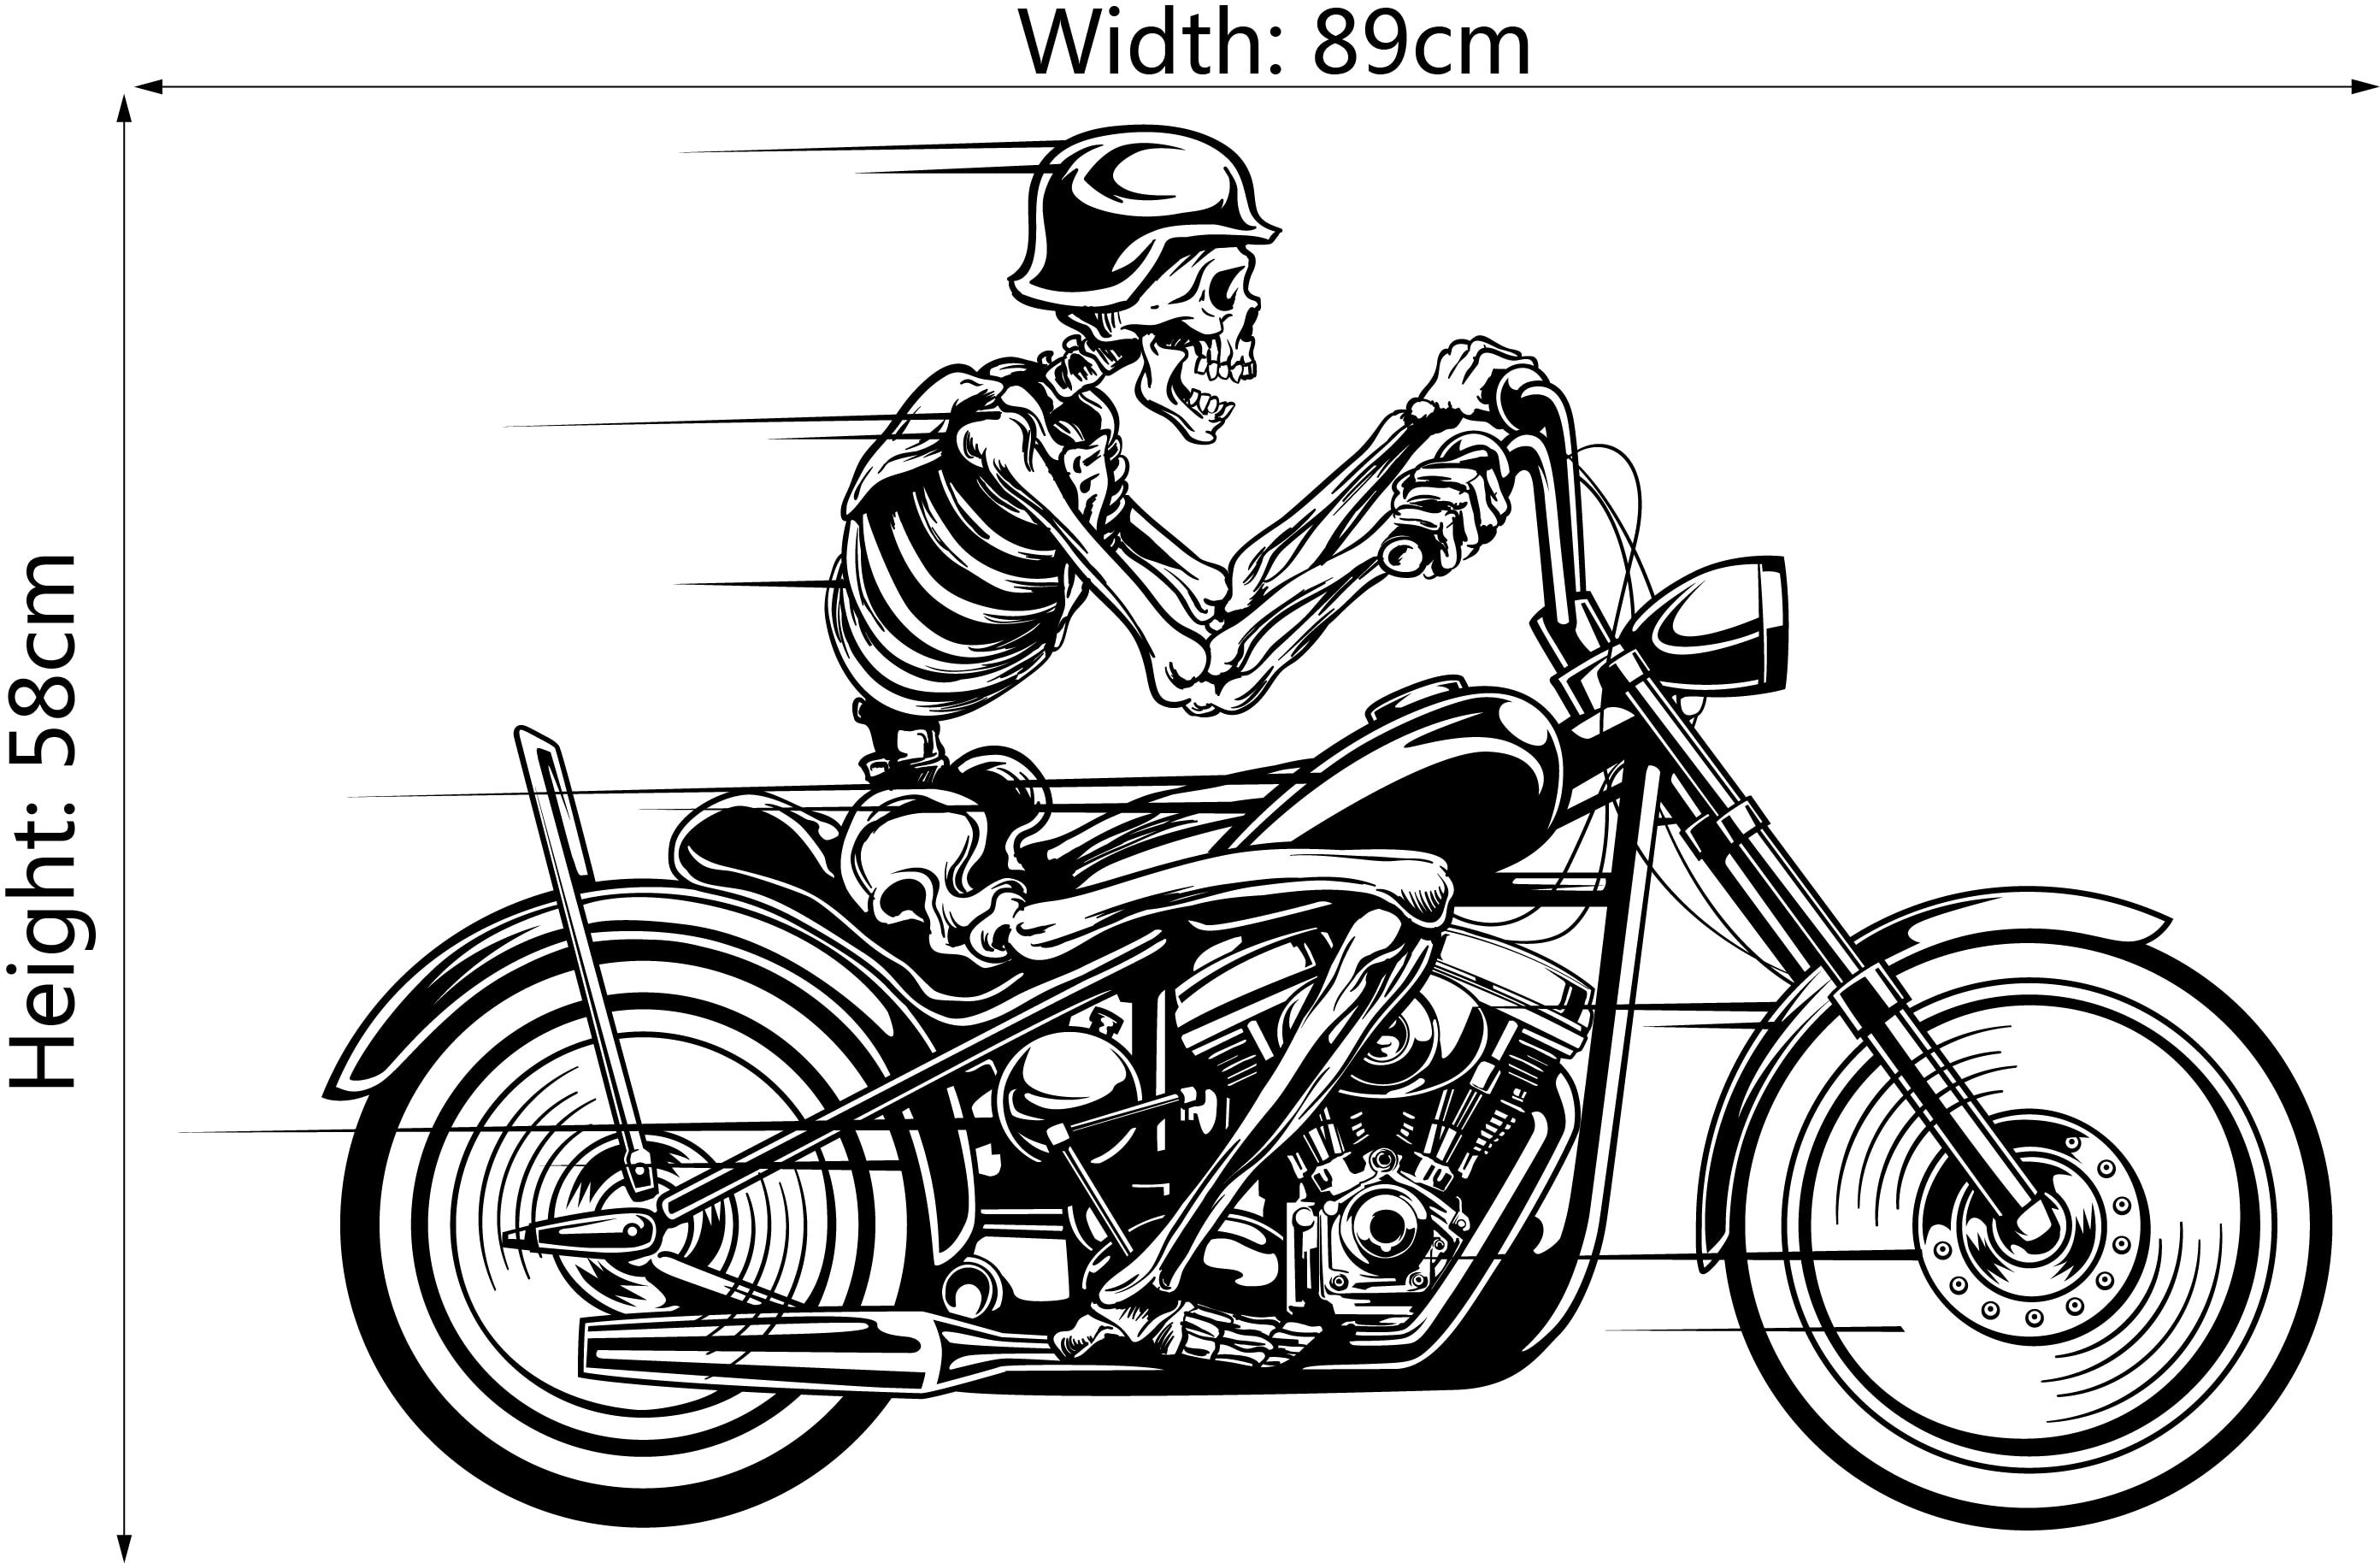 Dsu Skeleton Ride A Motorcycle Simple Speeding Art Wall